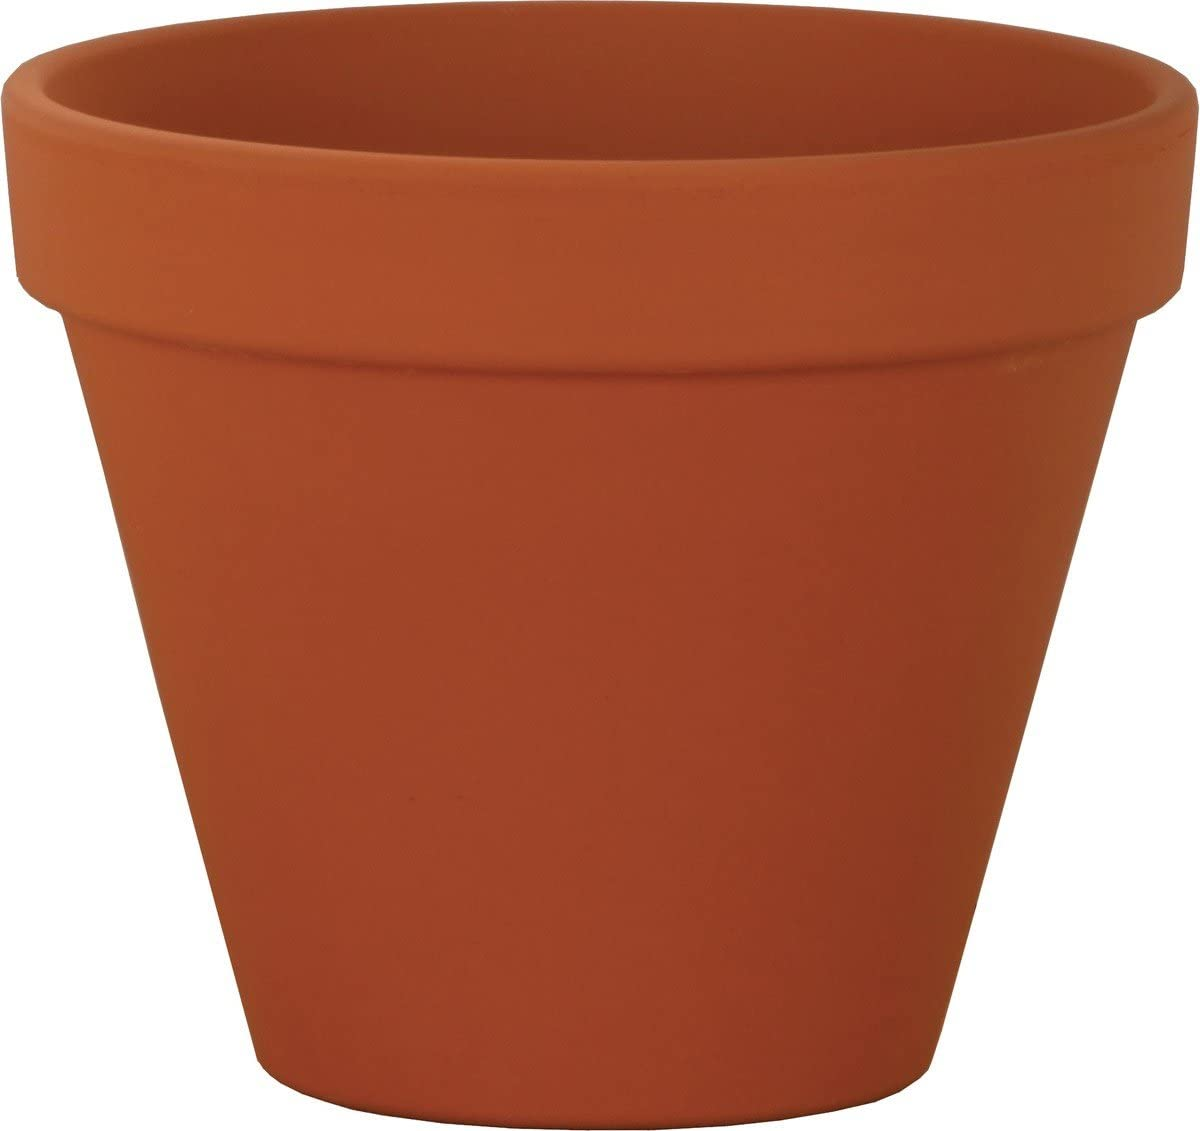 clay flower pot buy online Westerwälder Blumentopf-Fabrik Spang Plant Pot 2 x 2 x 2 cm